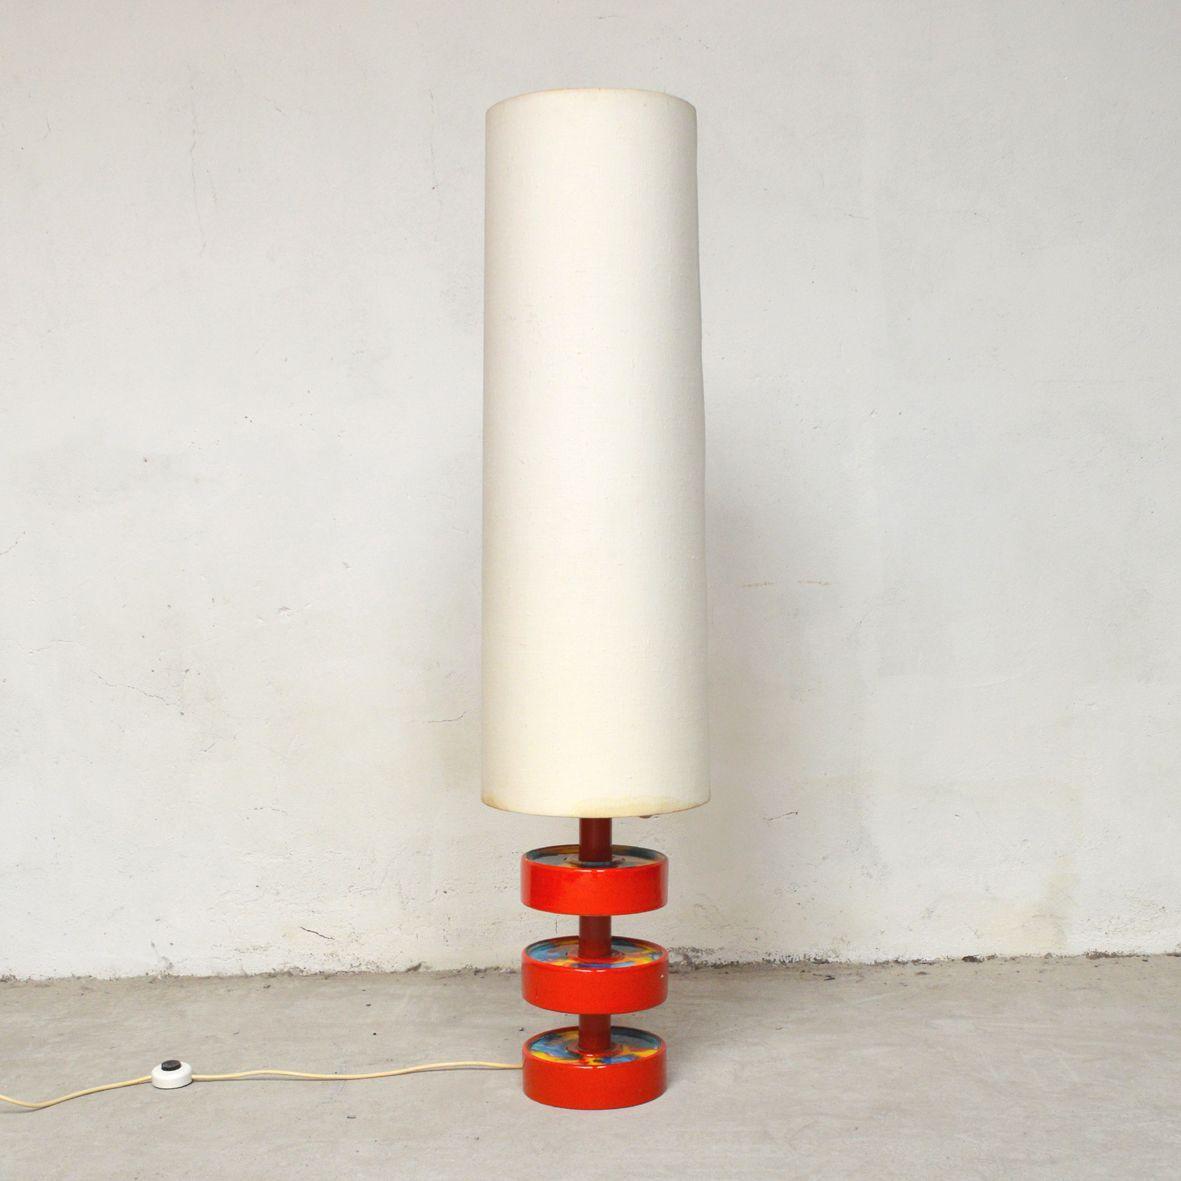 Led Deckenfluter Dimmbar Farbwechsel Stehlampen Retro Design